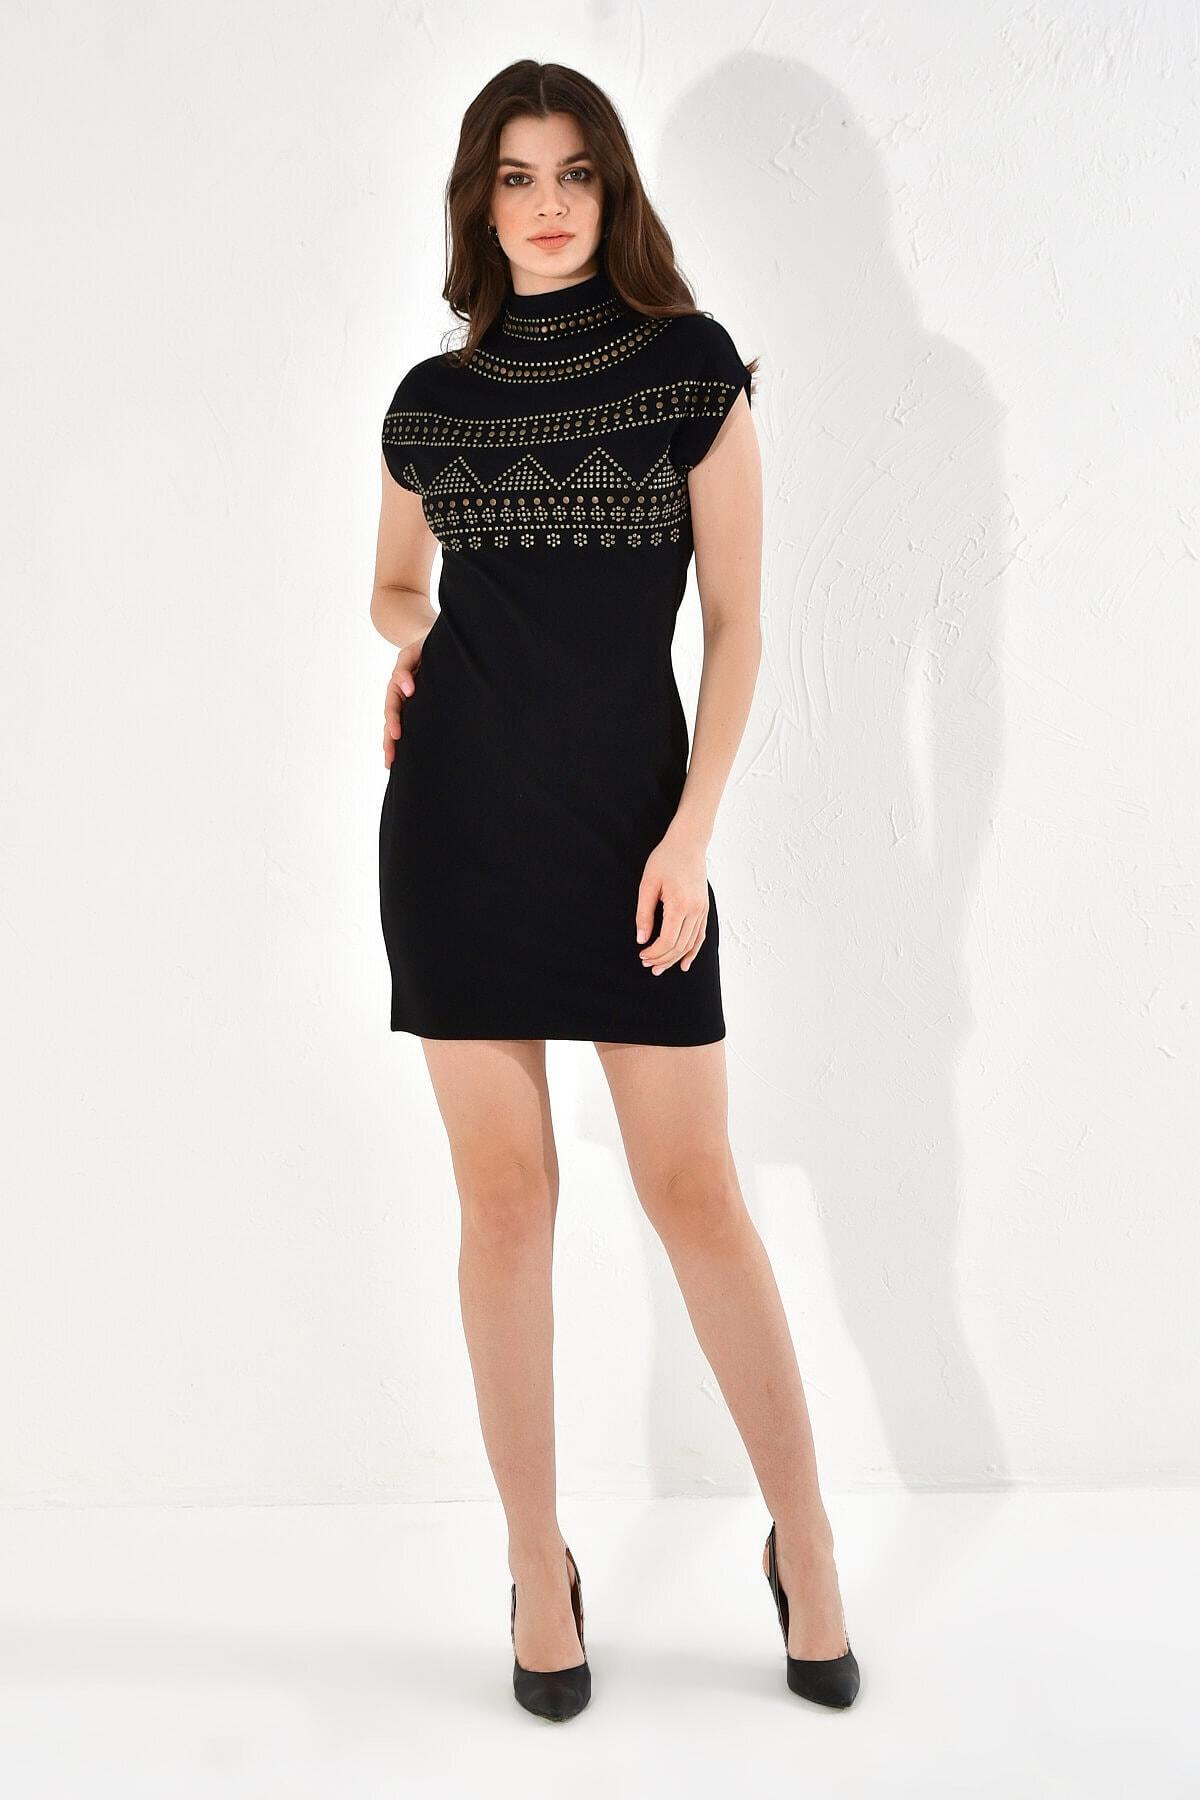 Hanna's by Hanna Darsa Kadın Taş Çakmalı Kolsuz Örme Elbise 1